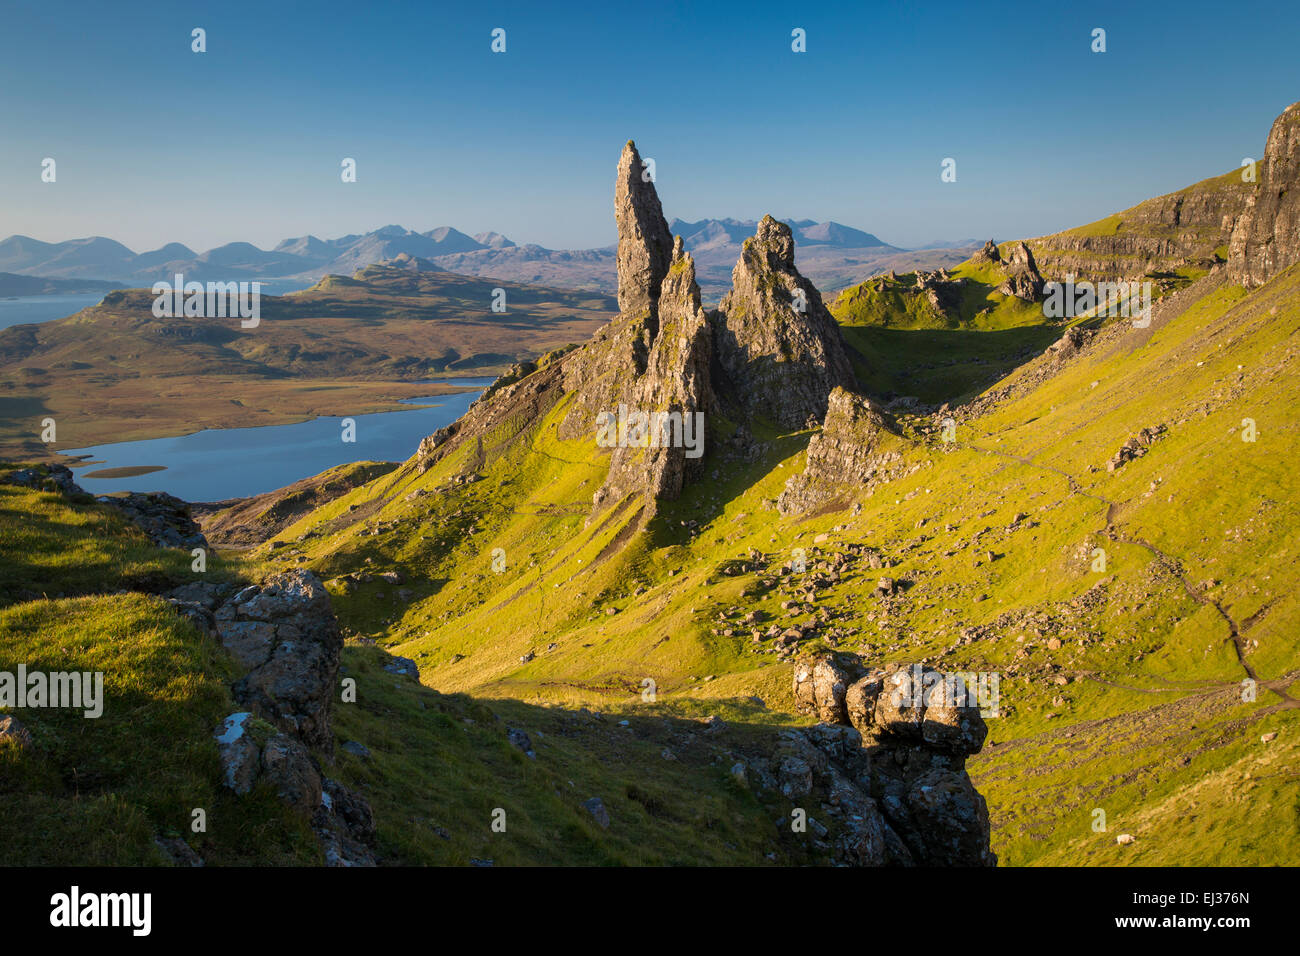 Dawn at the Old Man of Storr, Trotternish Peninsula, Isle of Skye, Scotland - Stock Image